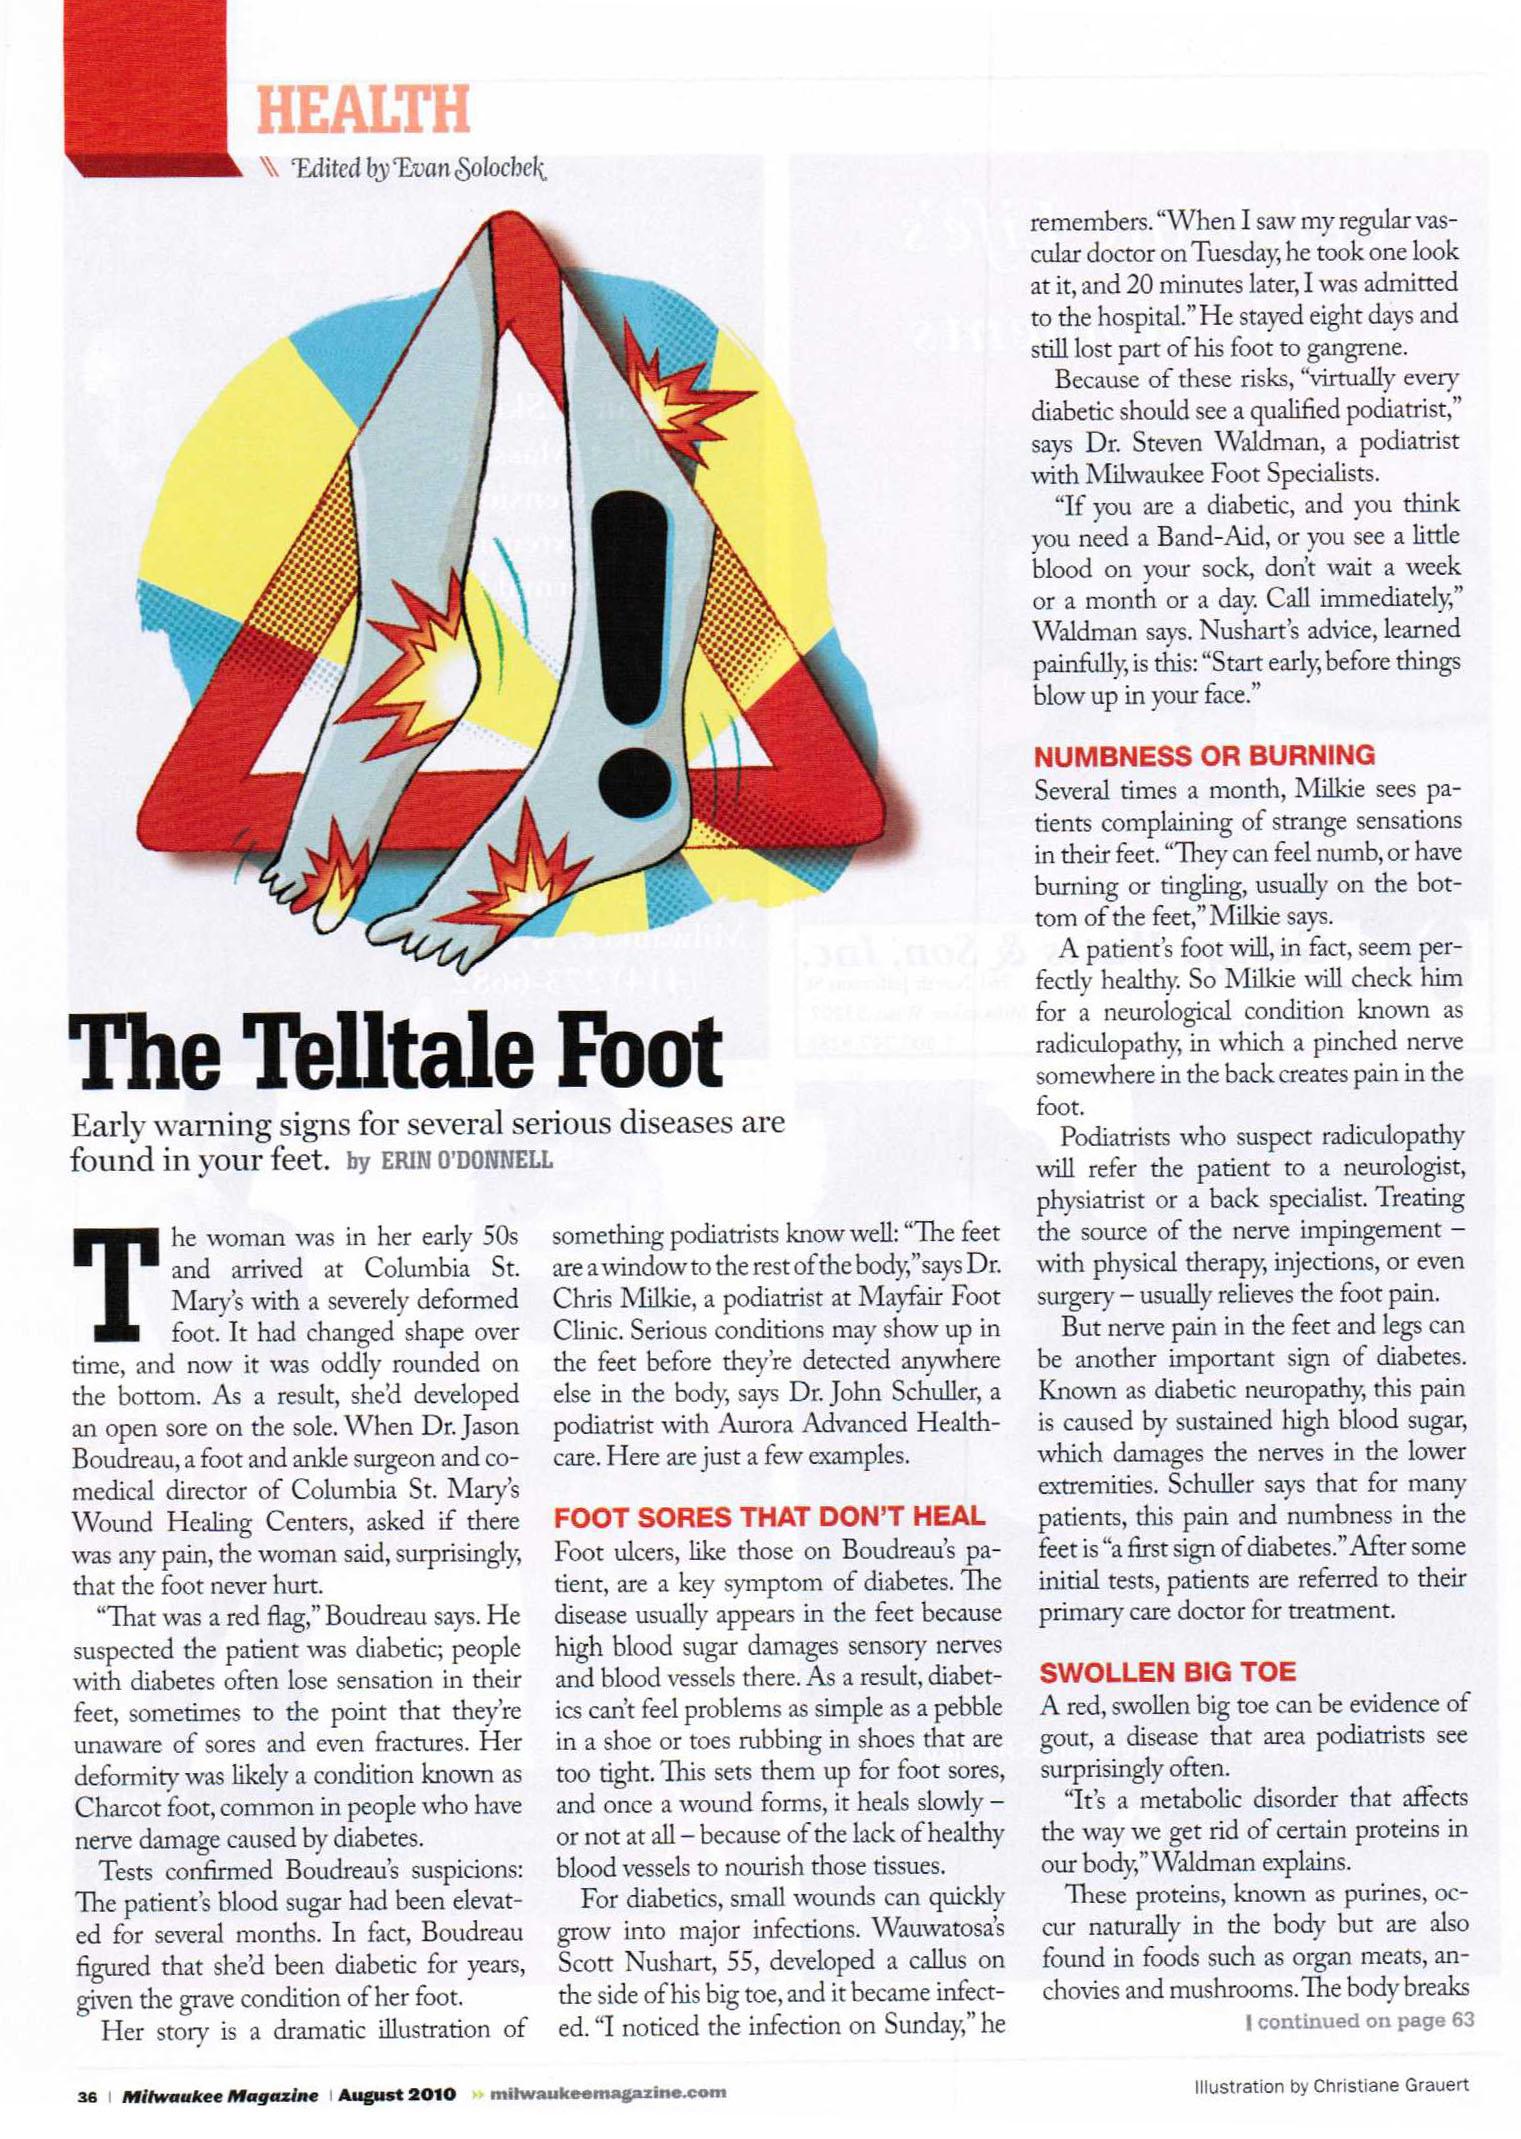 The Telltale Foot